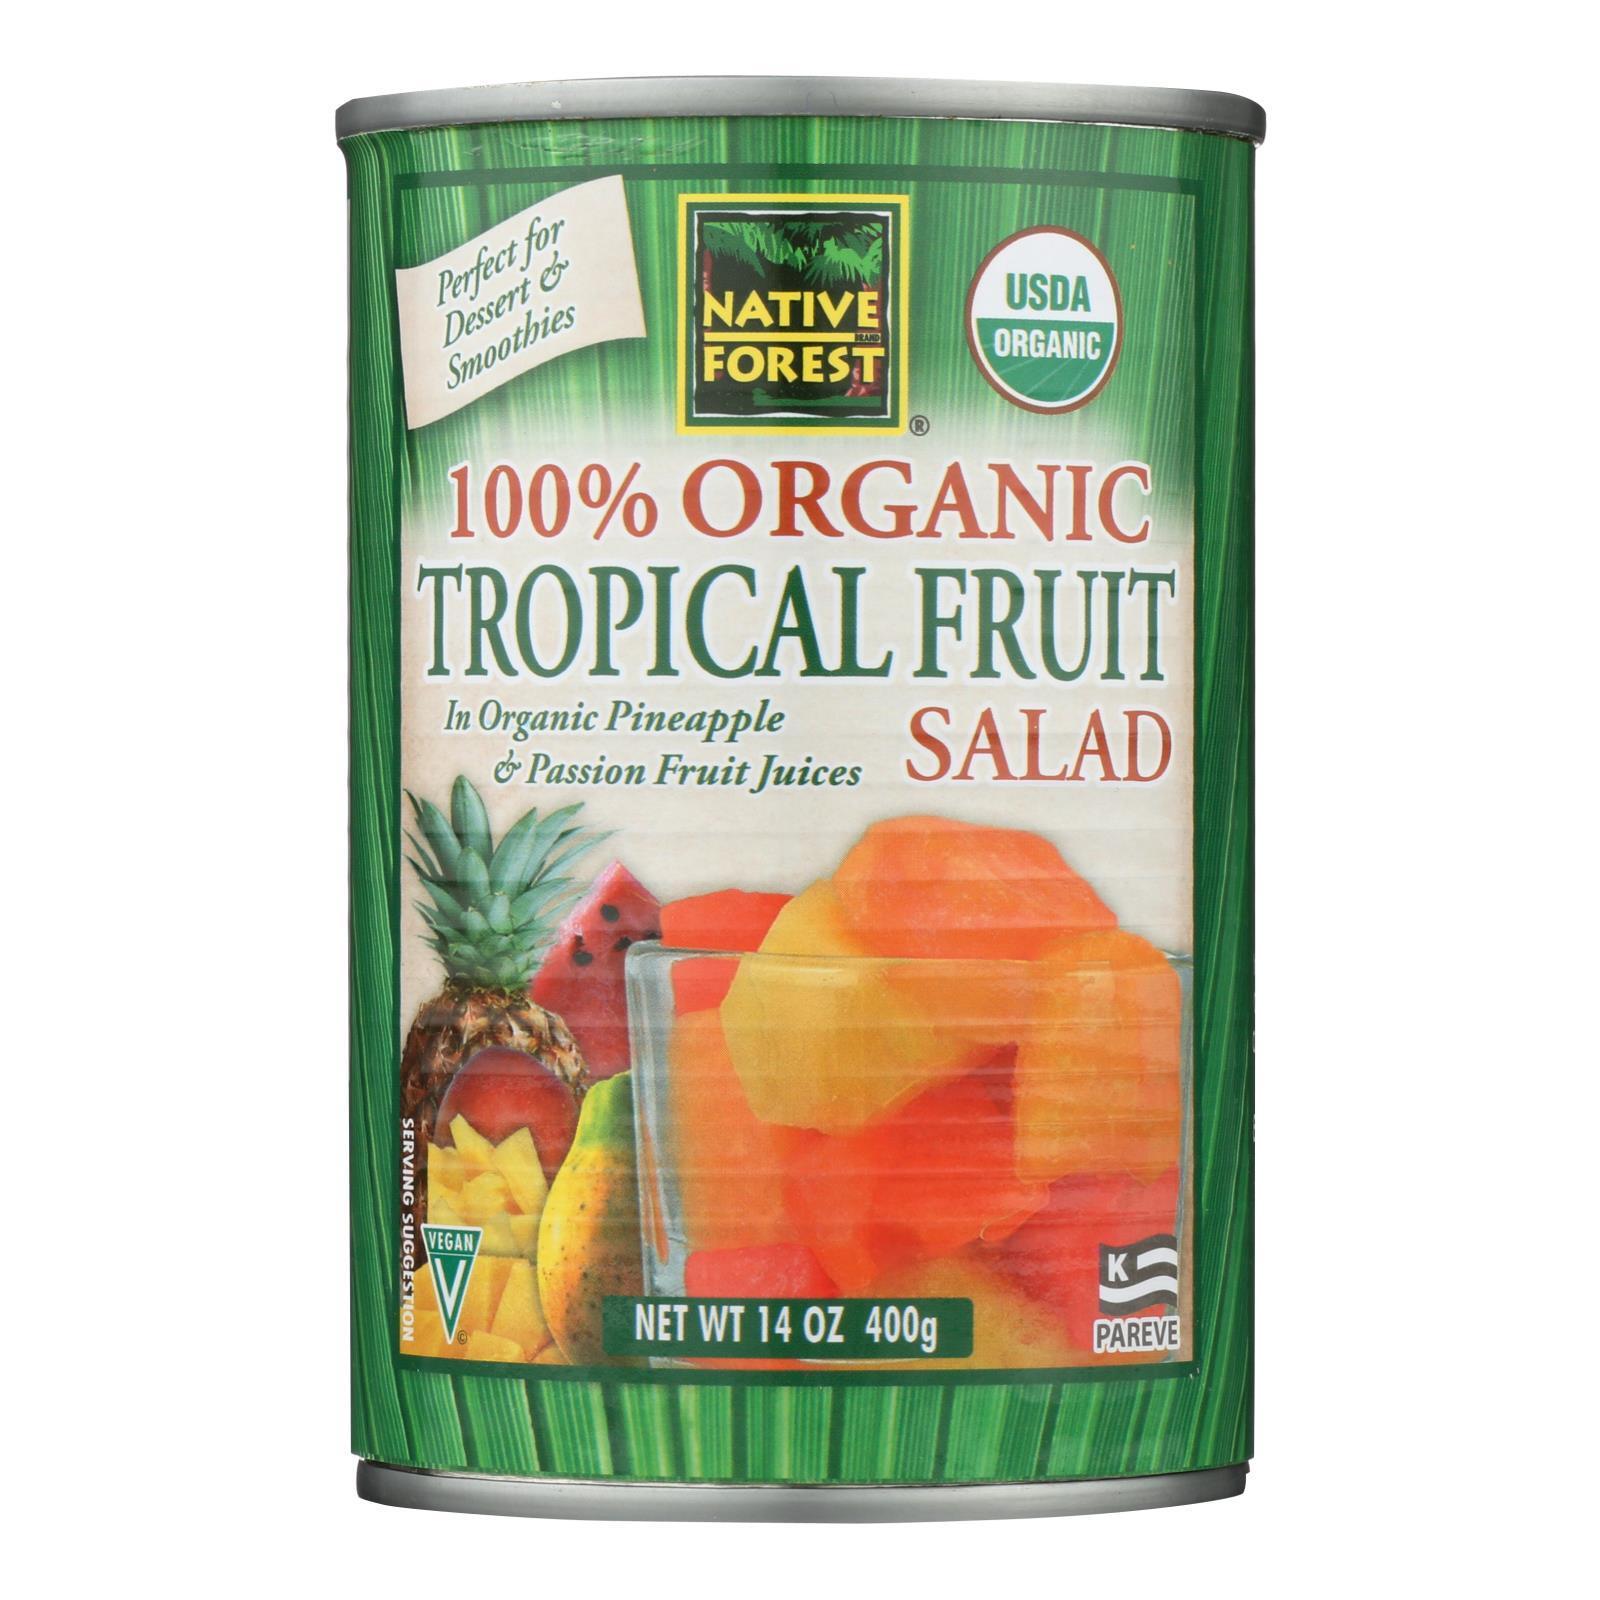 Native Forest Tropical Fruit Salad - Case of 6 - 14 oz.